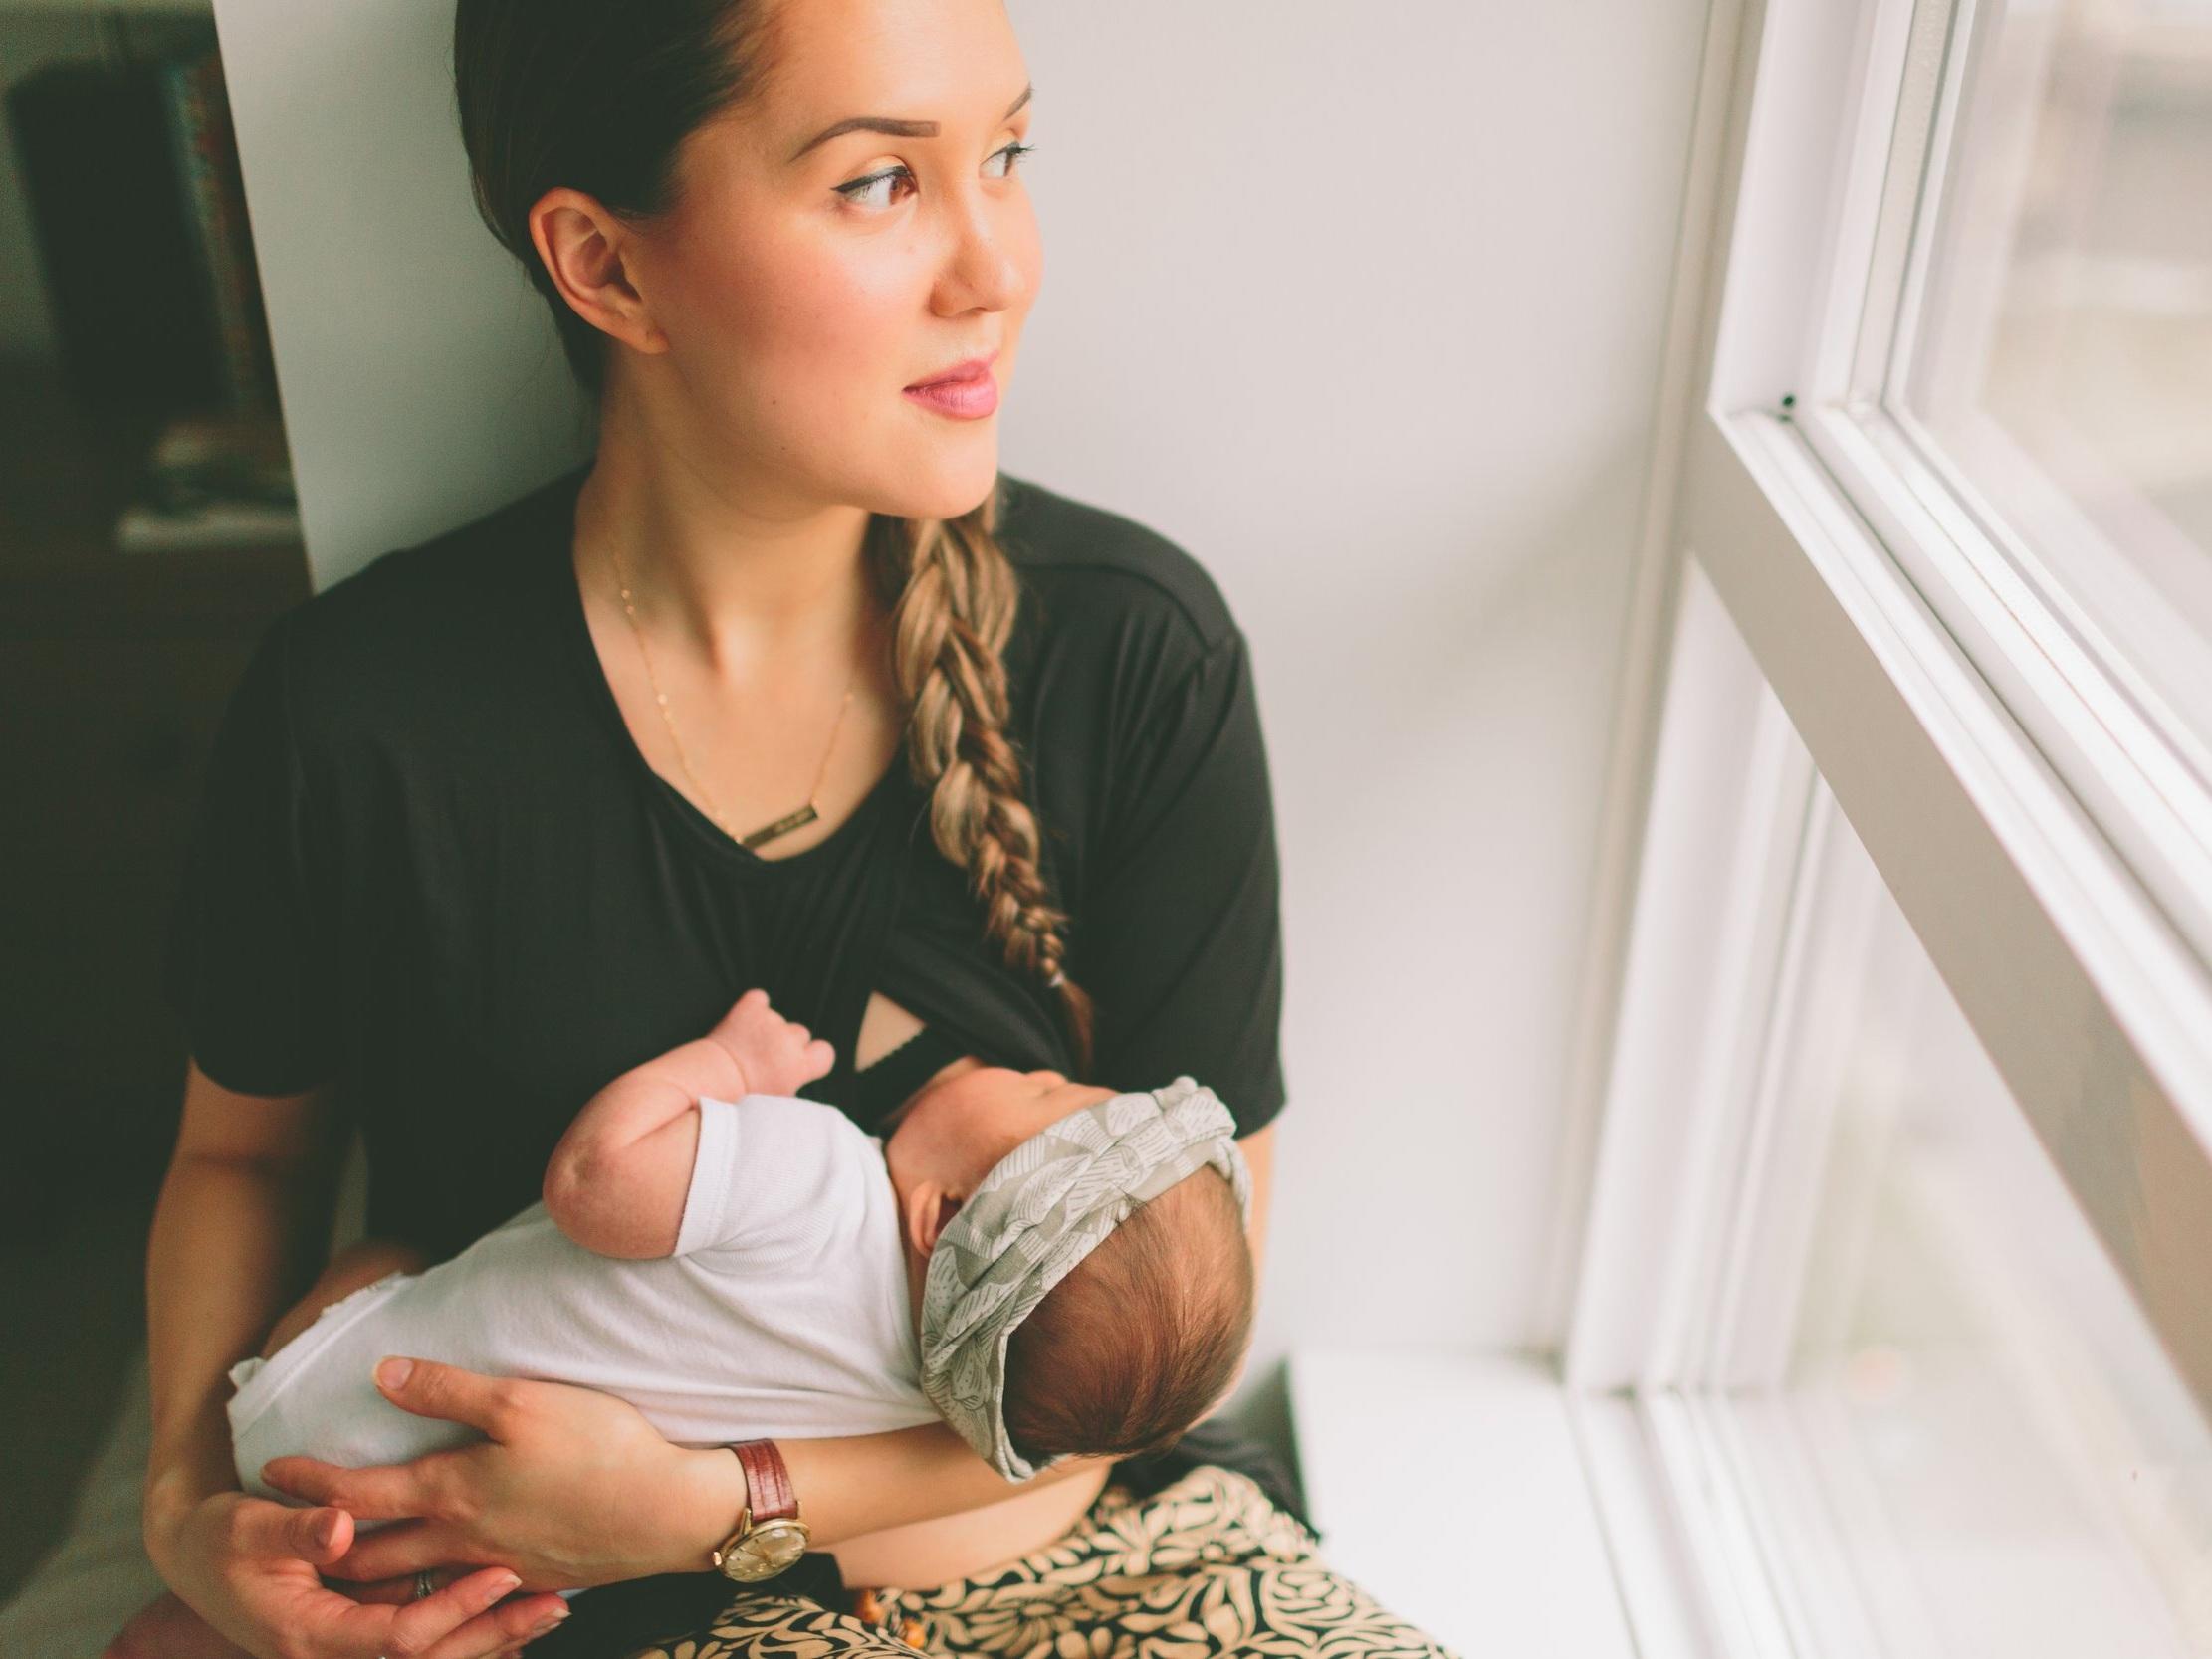 New mom breastfeeding newborn baby